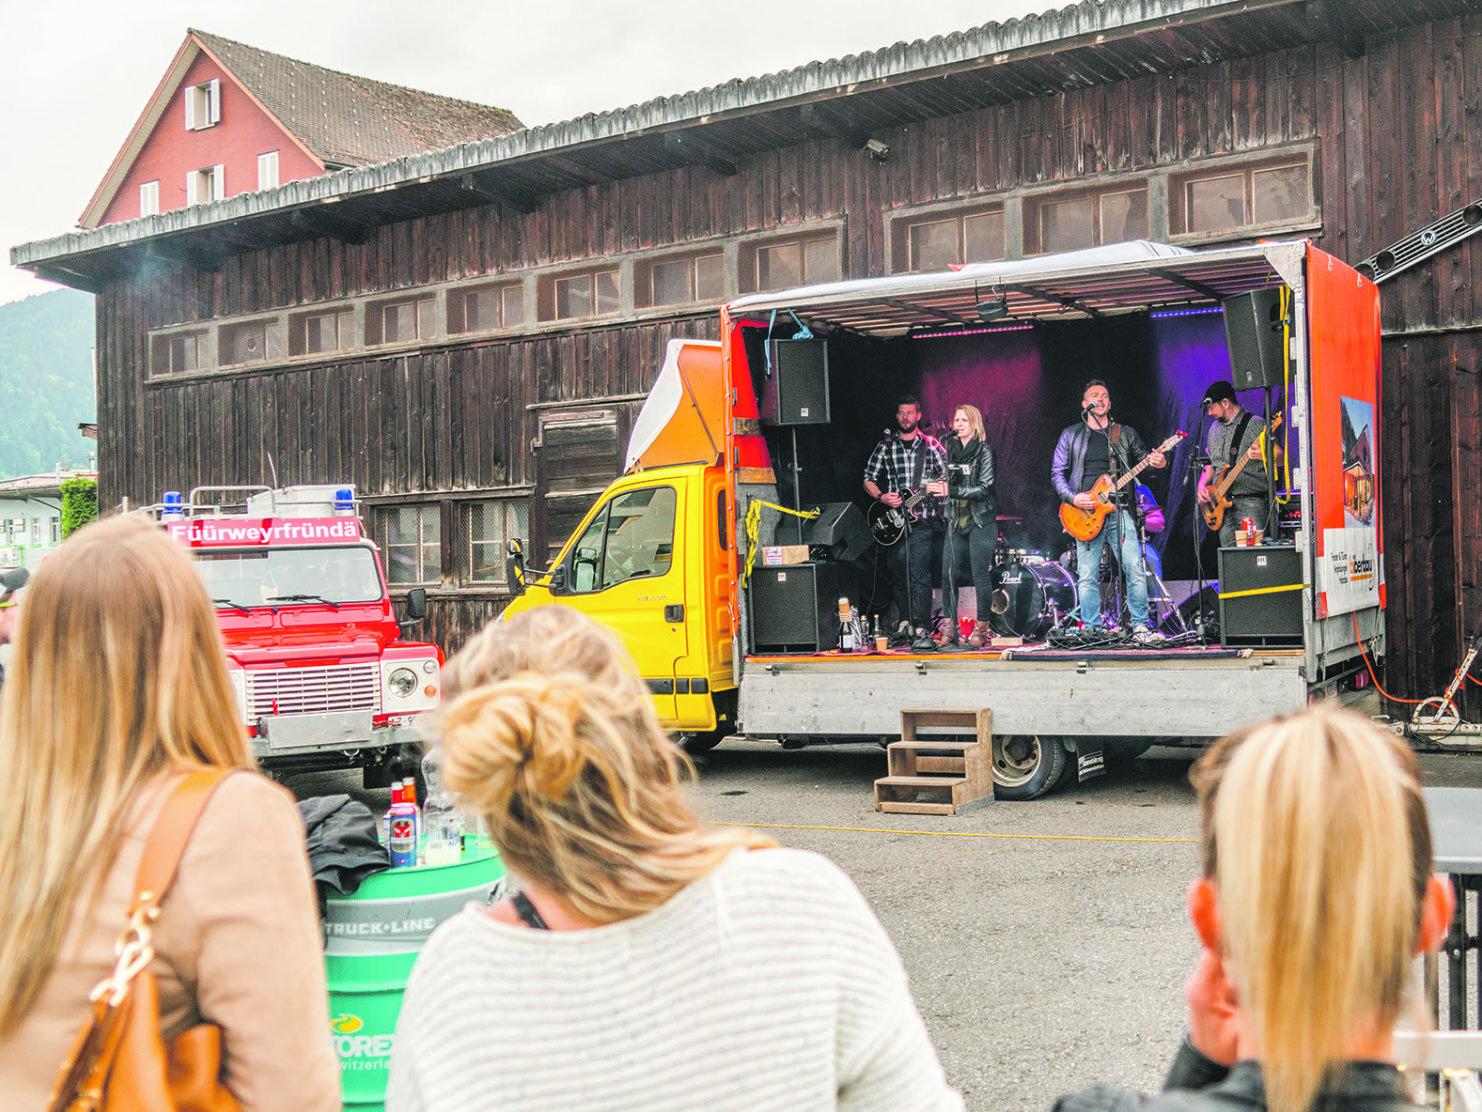 «Geheime» Konzert-Tournee brachte viel Freude in drei Dörfer